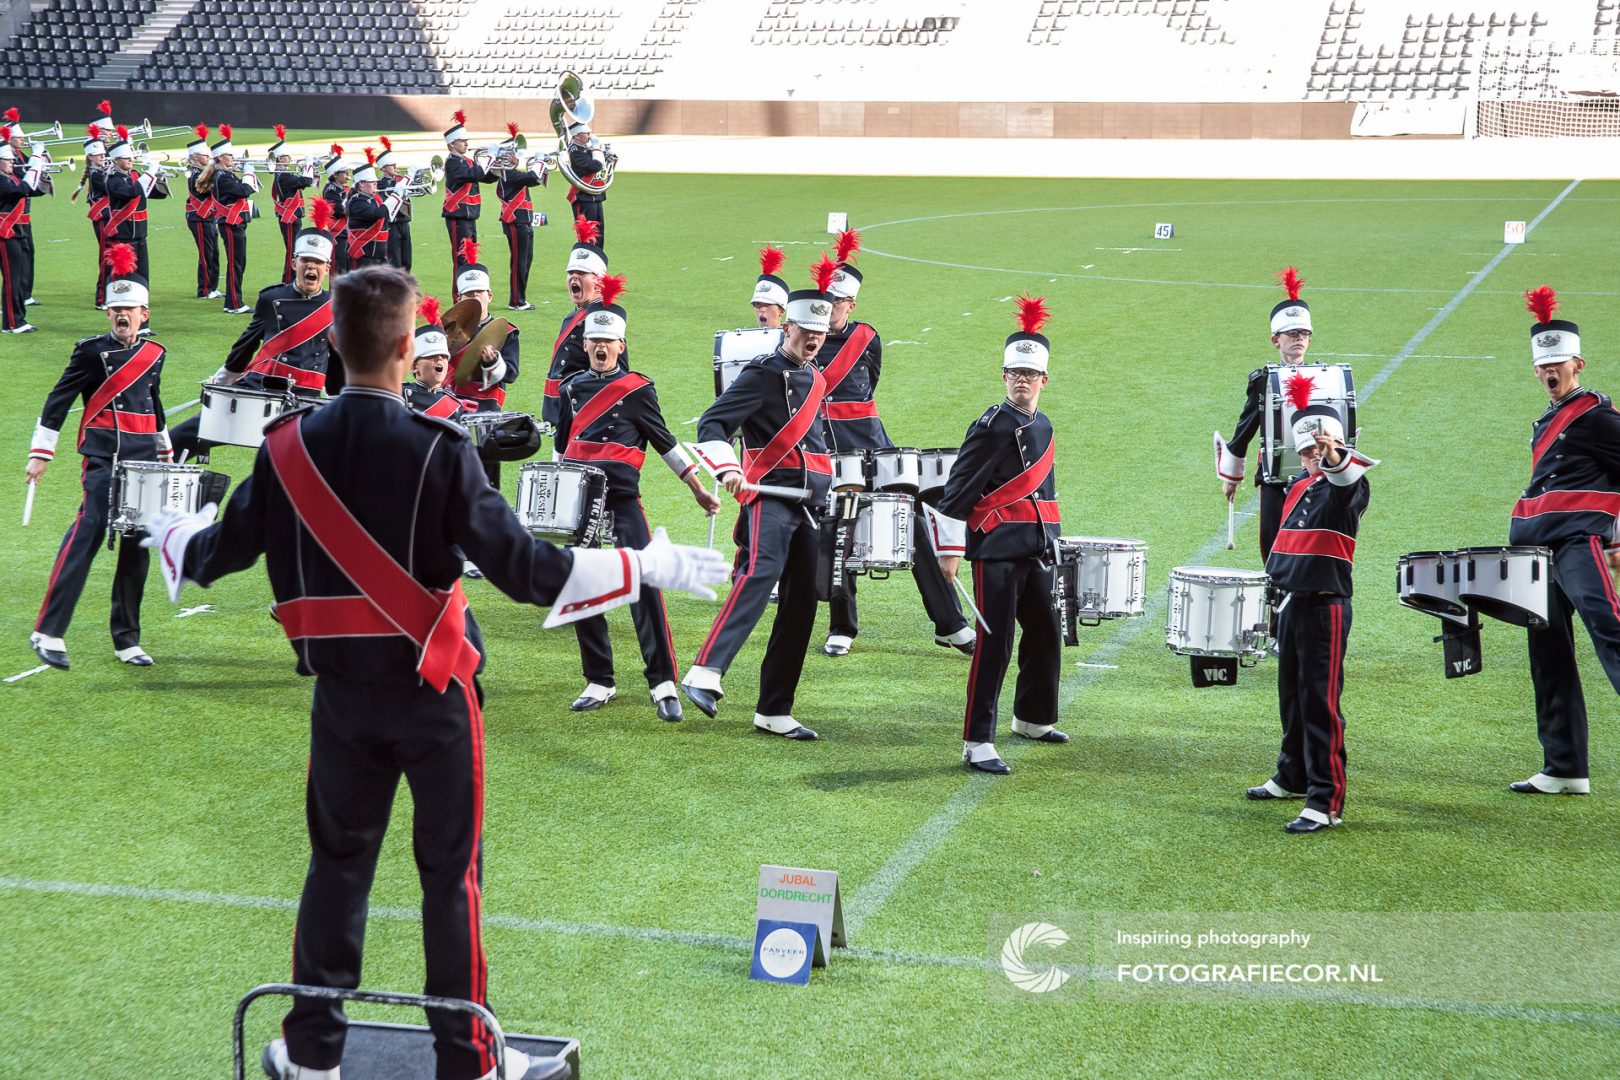 Jong KTK| Jeudkorps | Kampen | Drumcore | muziek | showband | Taptoe | Korpsmuziek